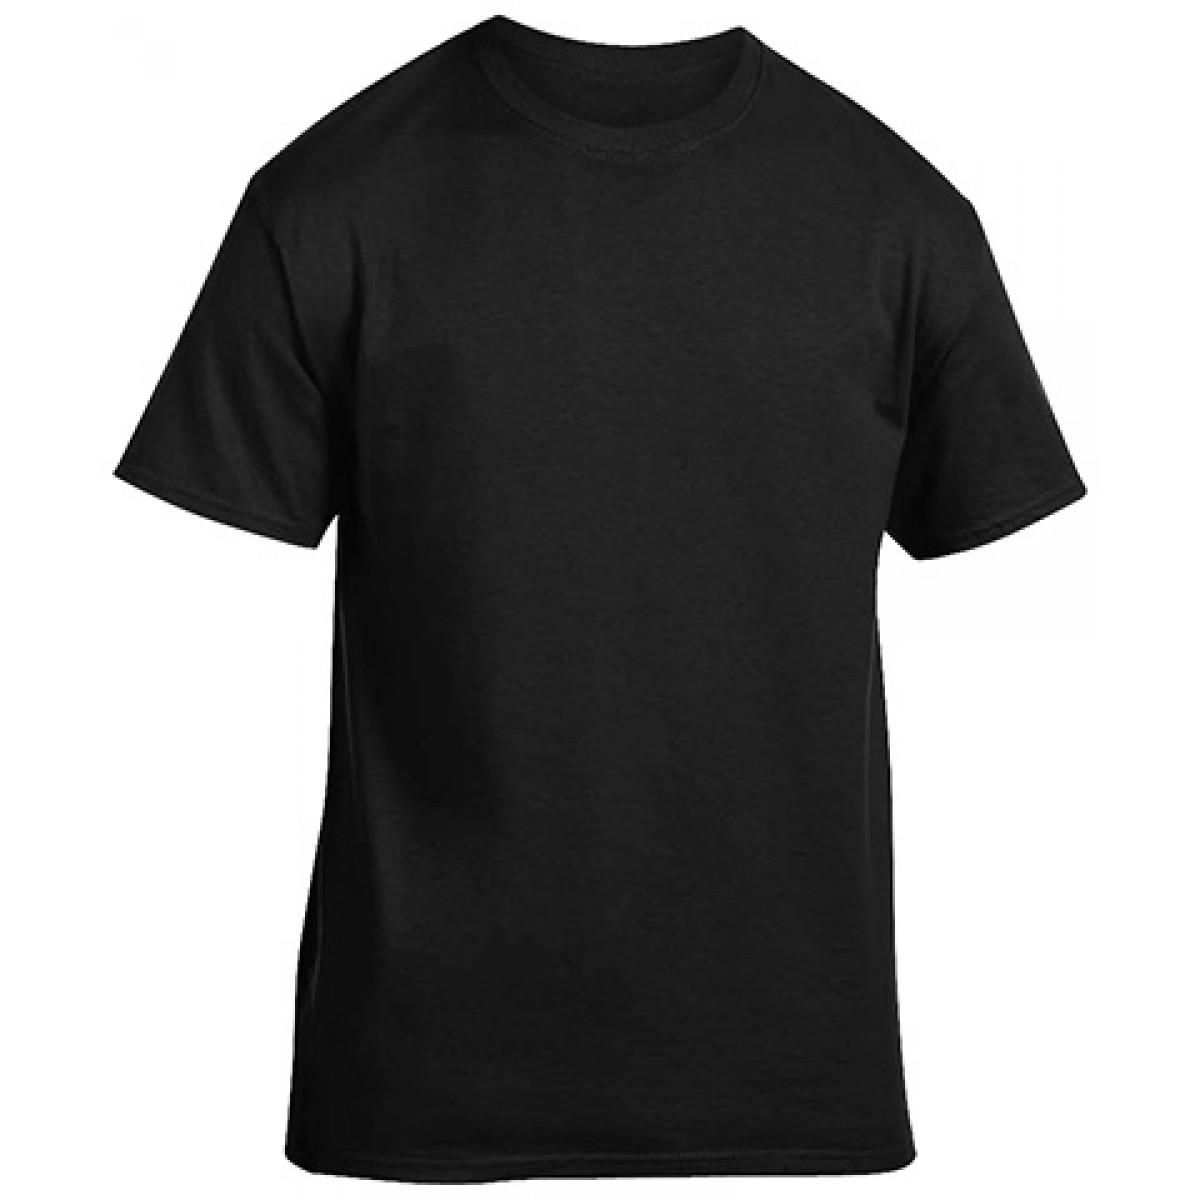 Cotton Short Sleeve T-Shirt-Black-YM